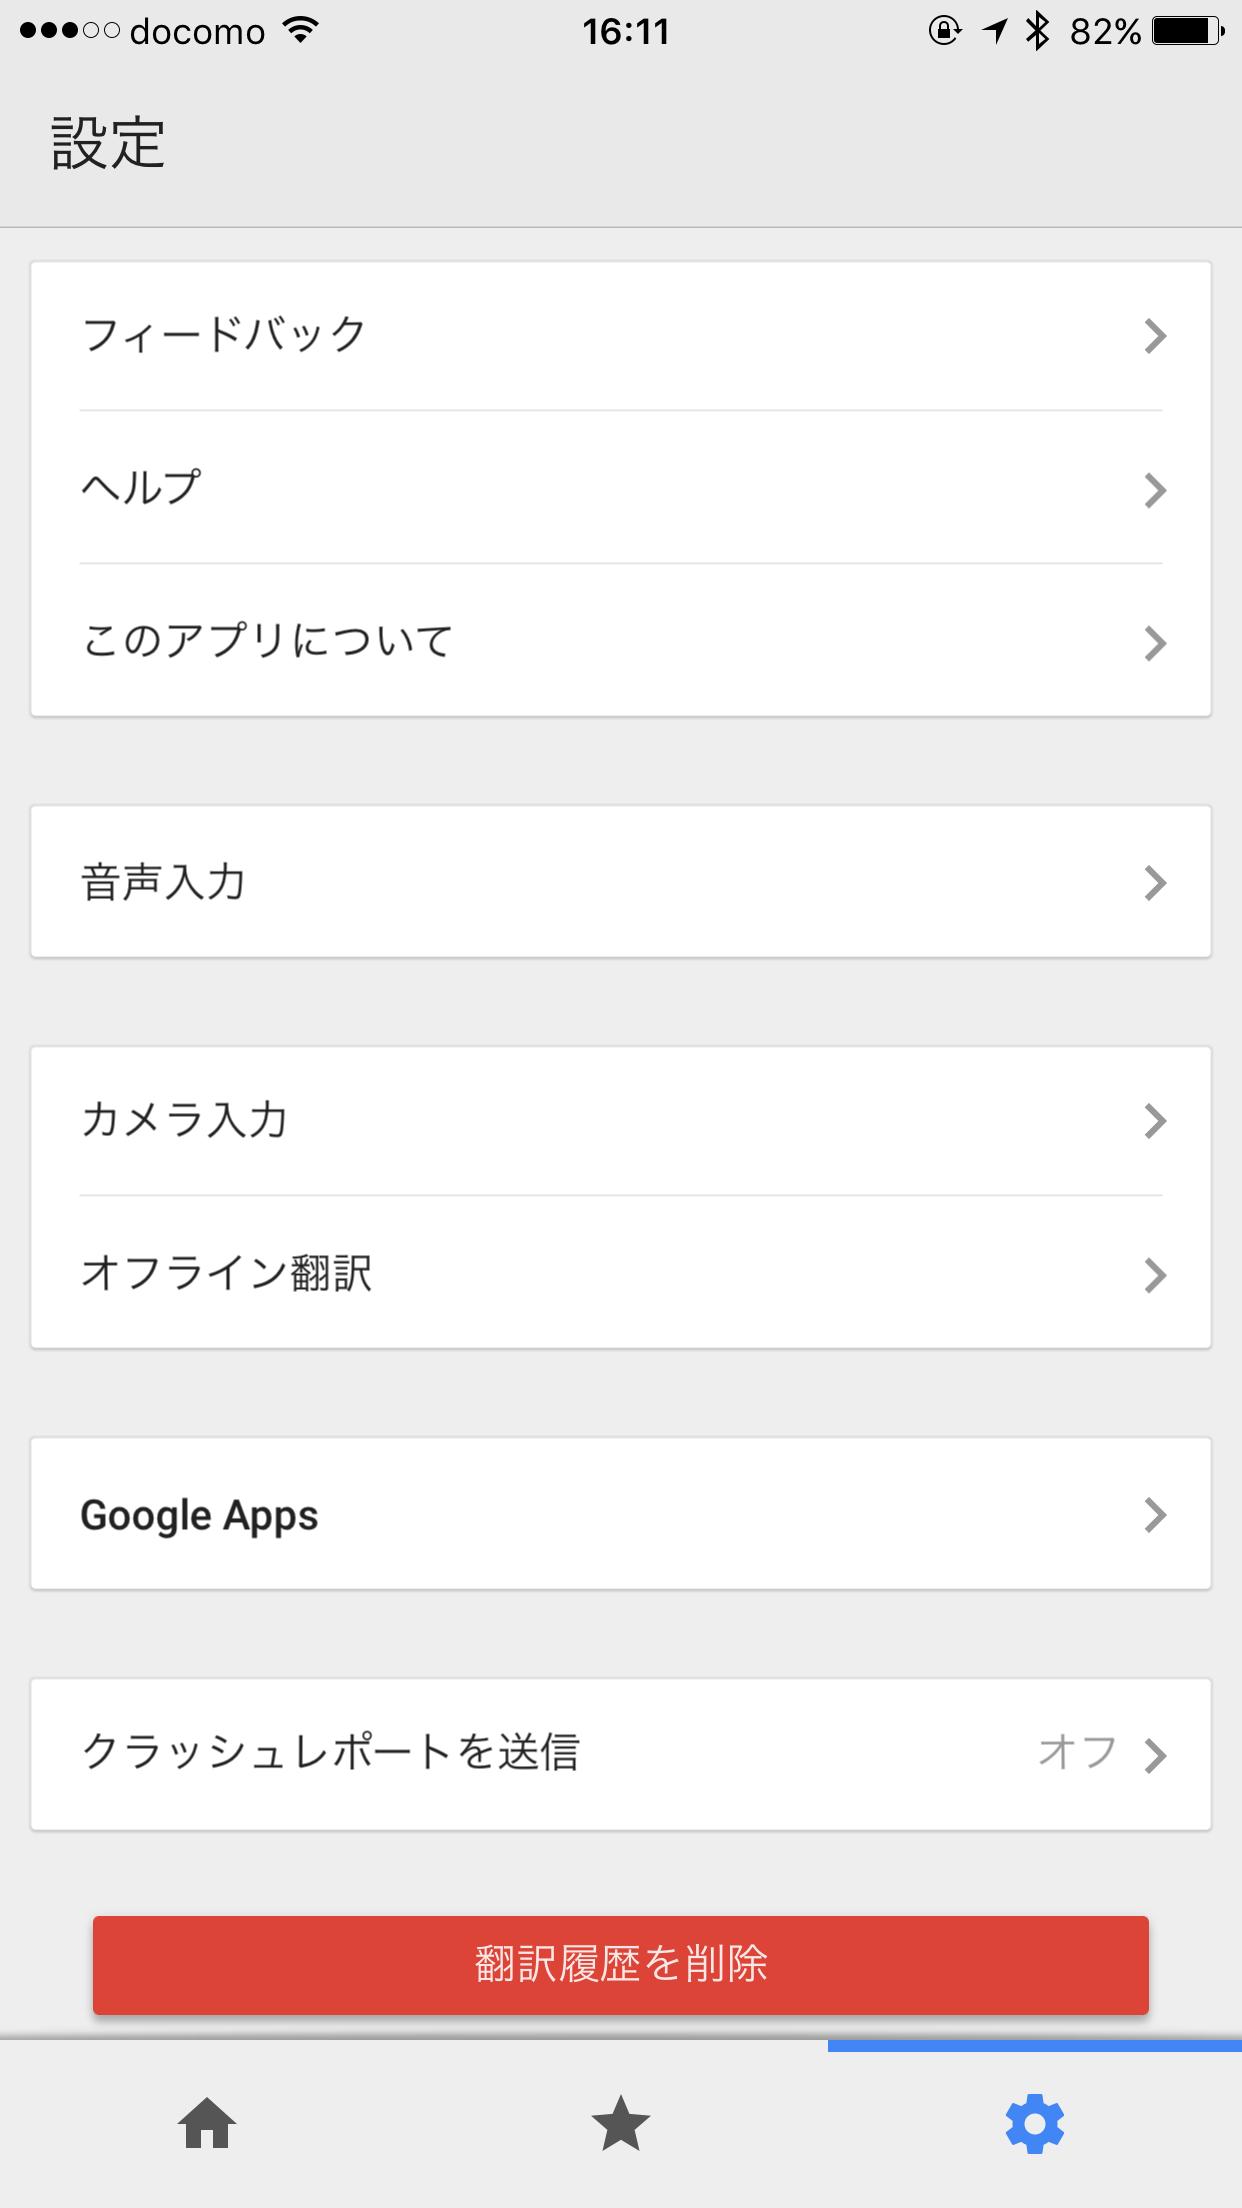 iOS版の設定メニュー